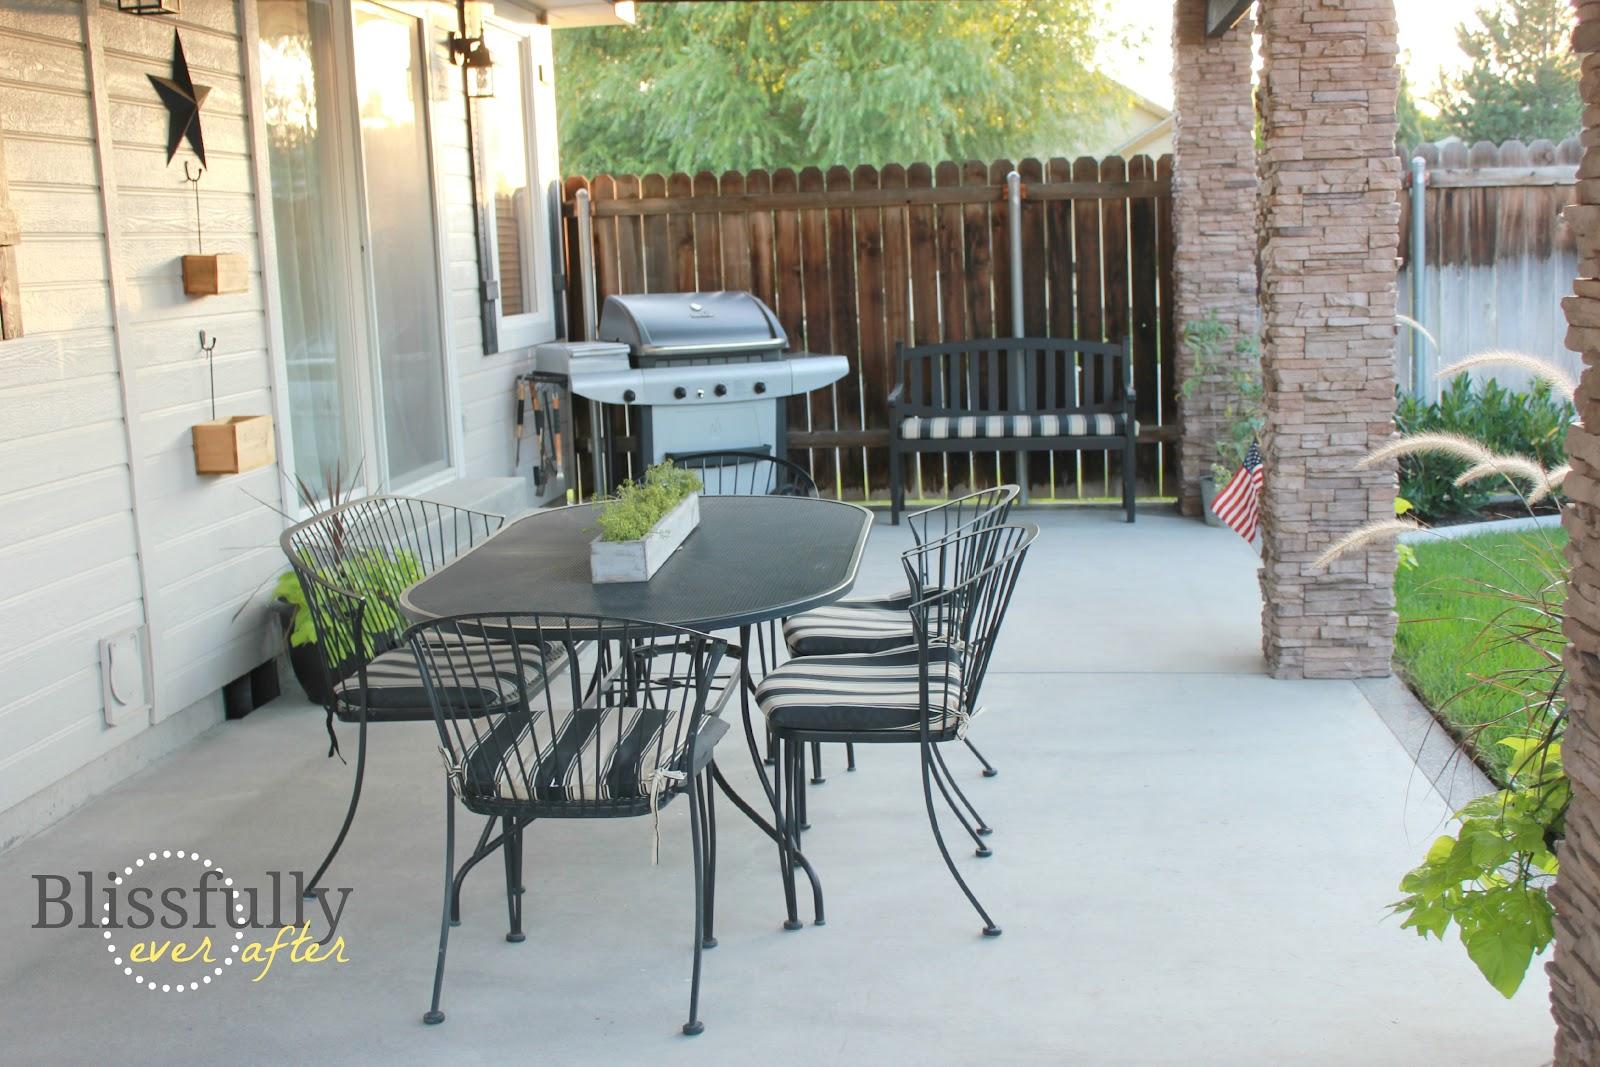 Diy backyard makeover grace filled interiors for Deck makeover on a budget